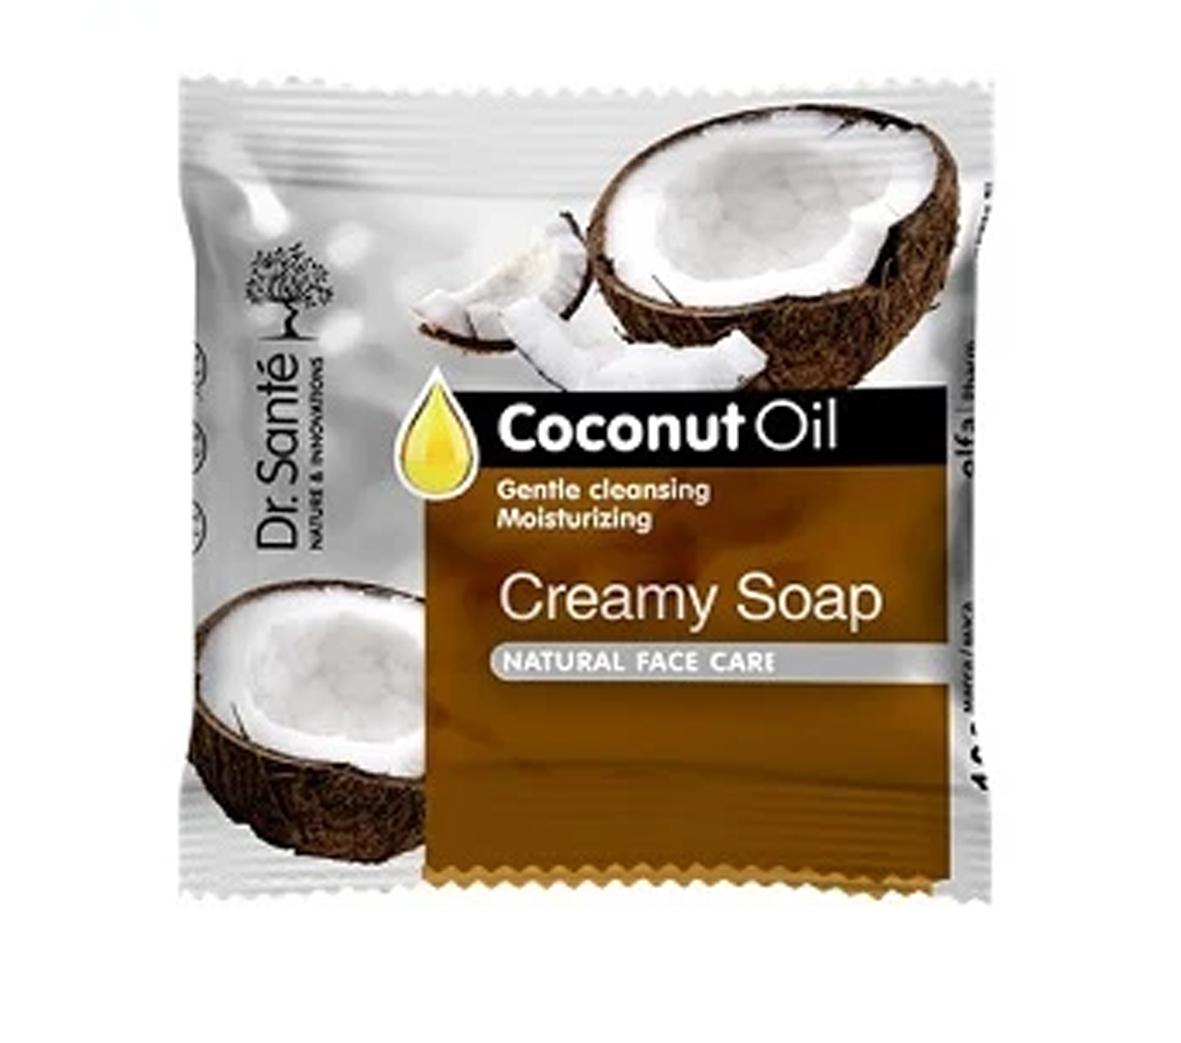 Dr. Santé kokosový olej - krémové mydlo, 100 g